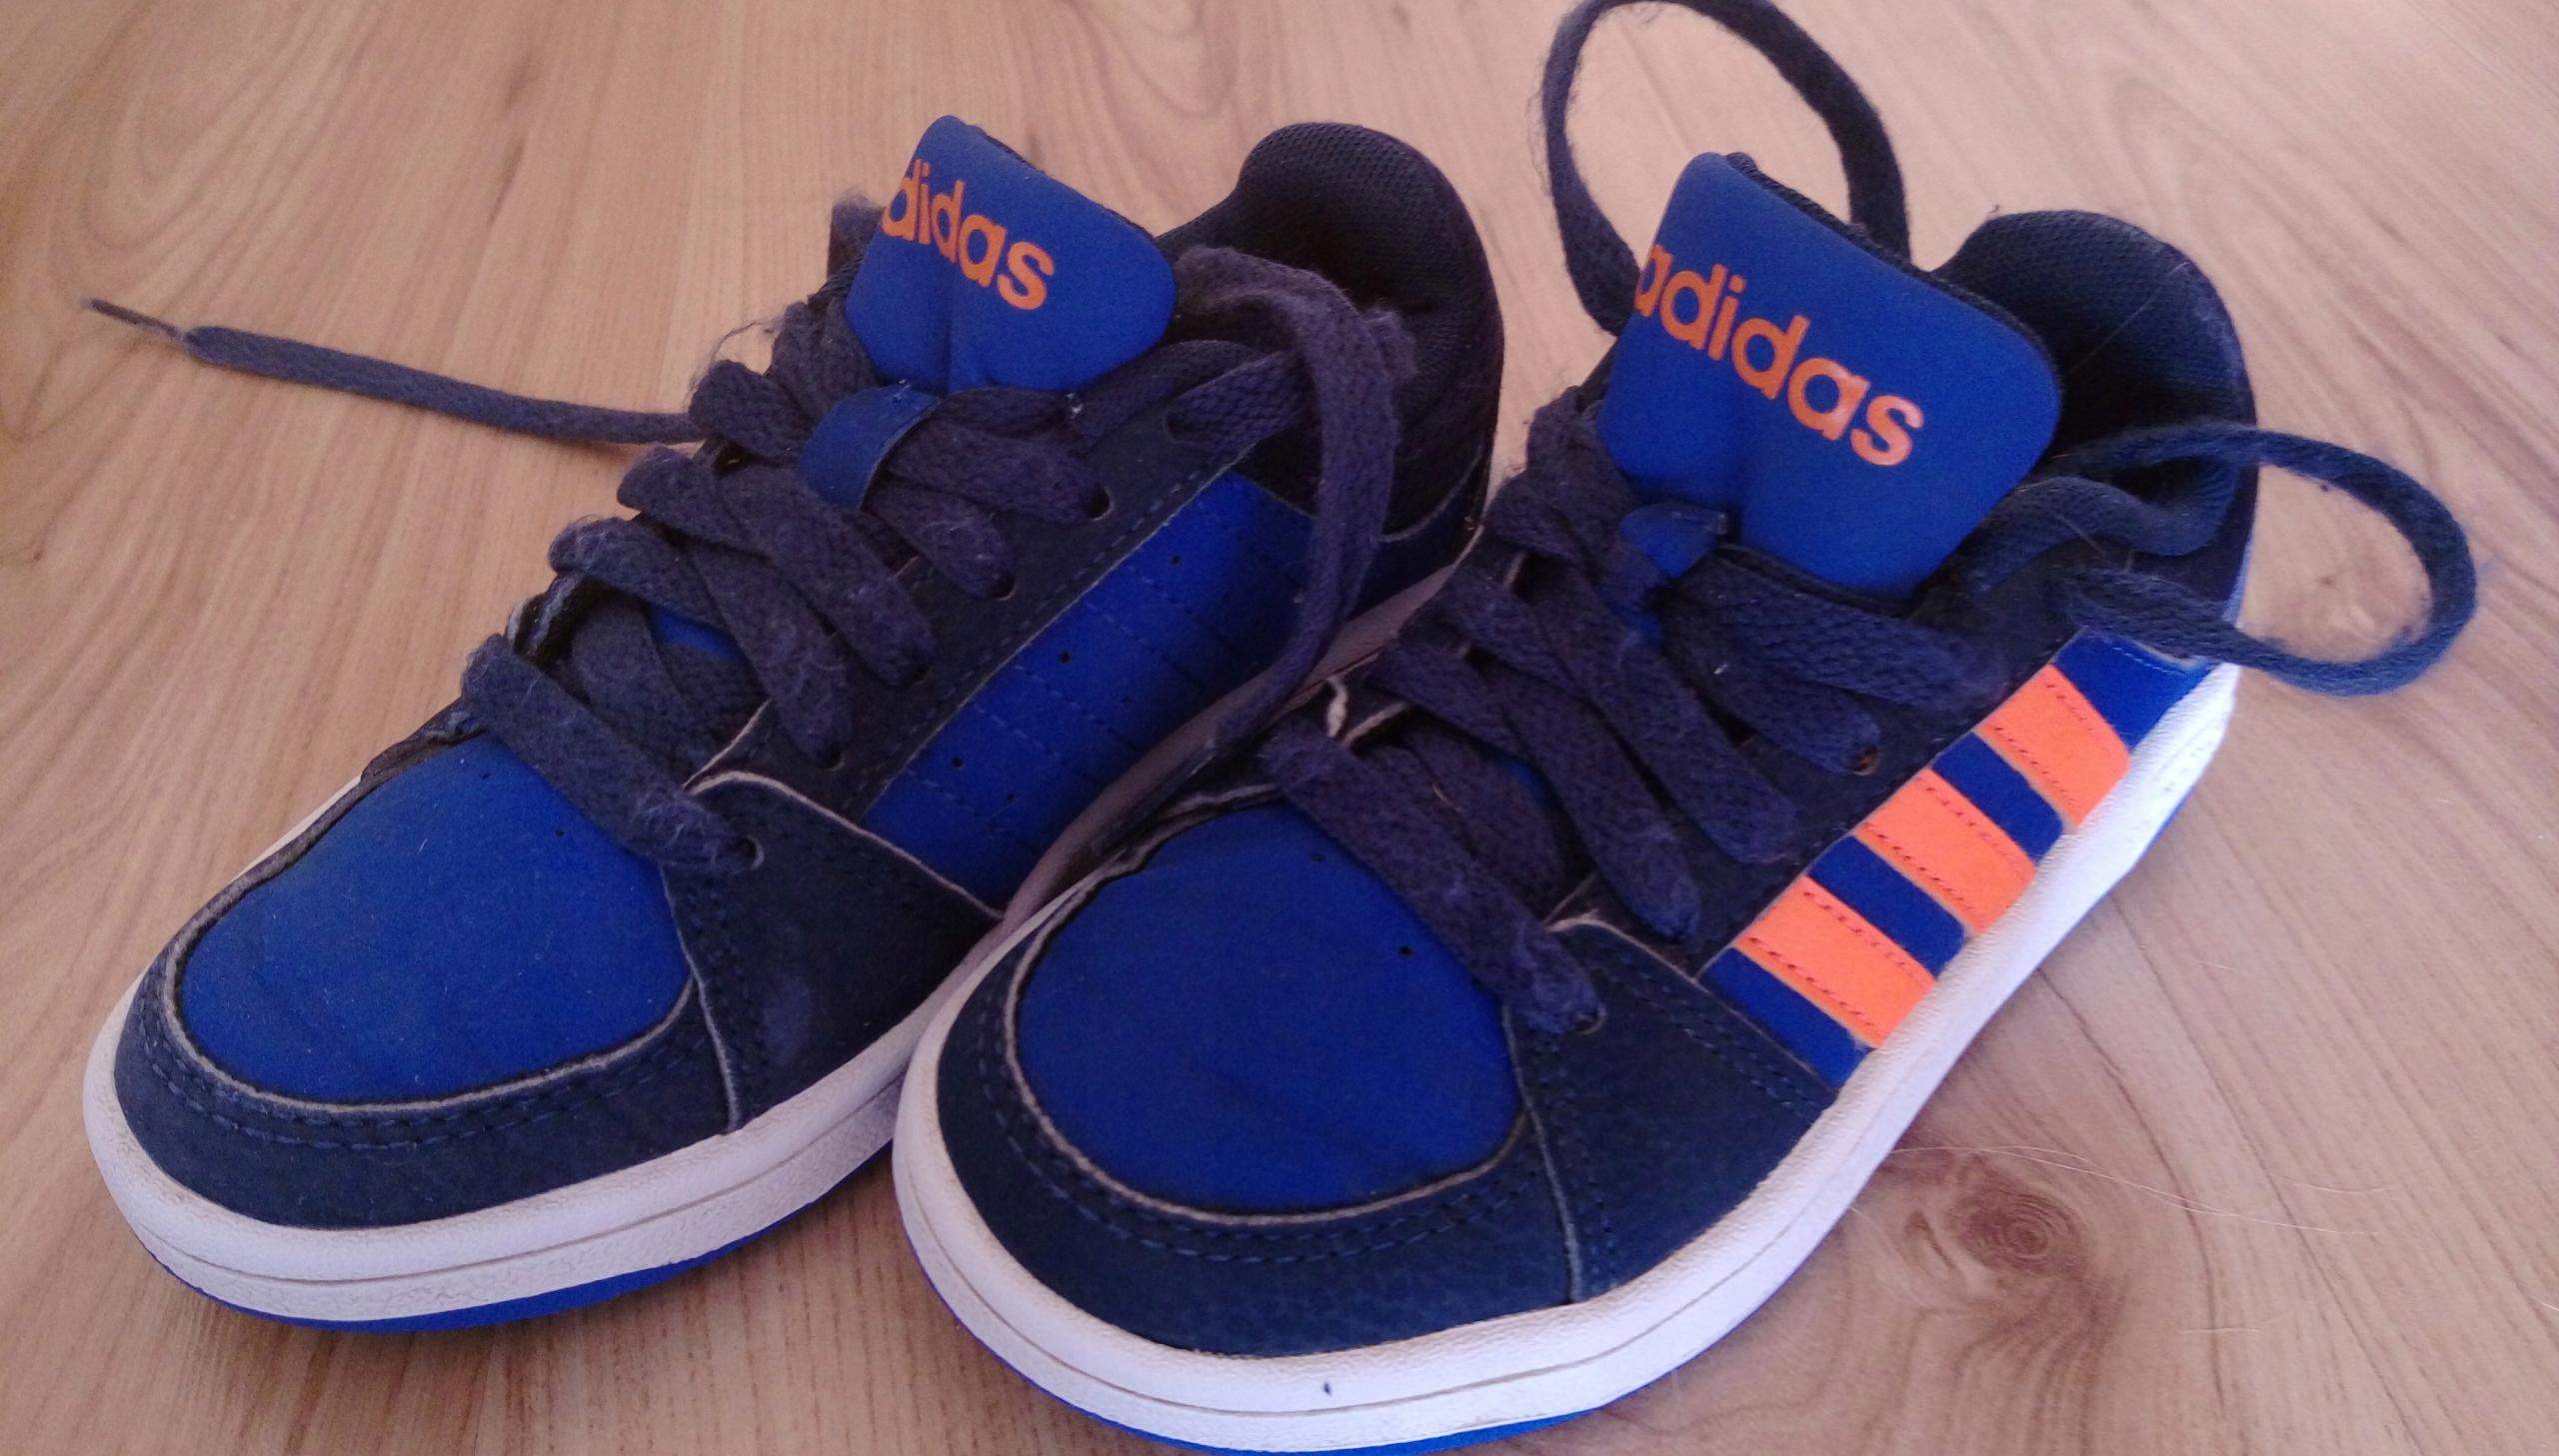 8bd0f4eeb938b Buty Adidas rozmiar 28 - 7584076651 - oficjalne archiwum allegro